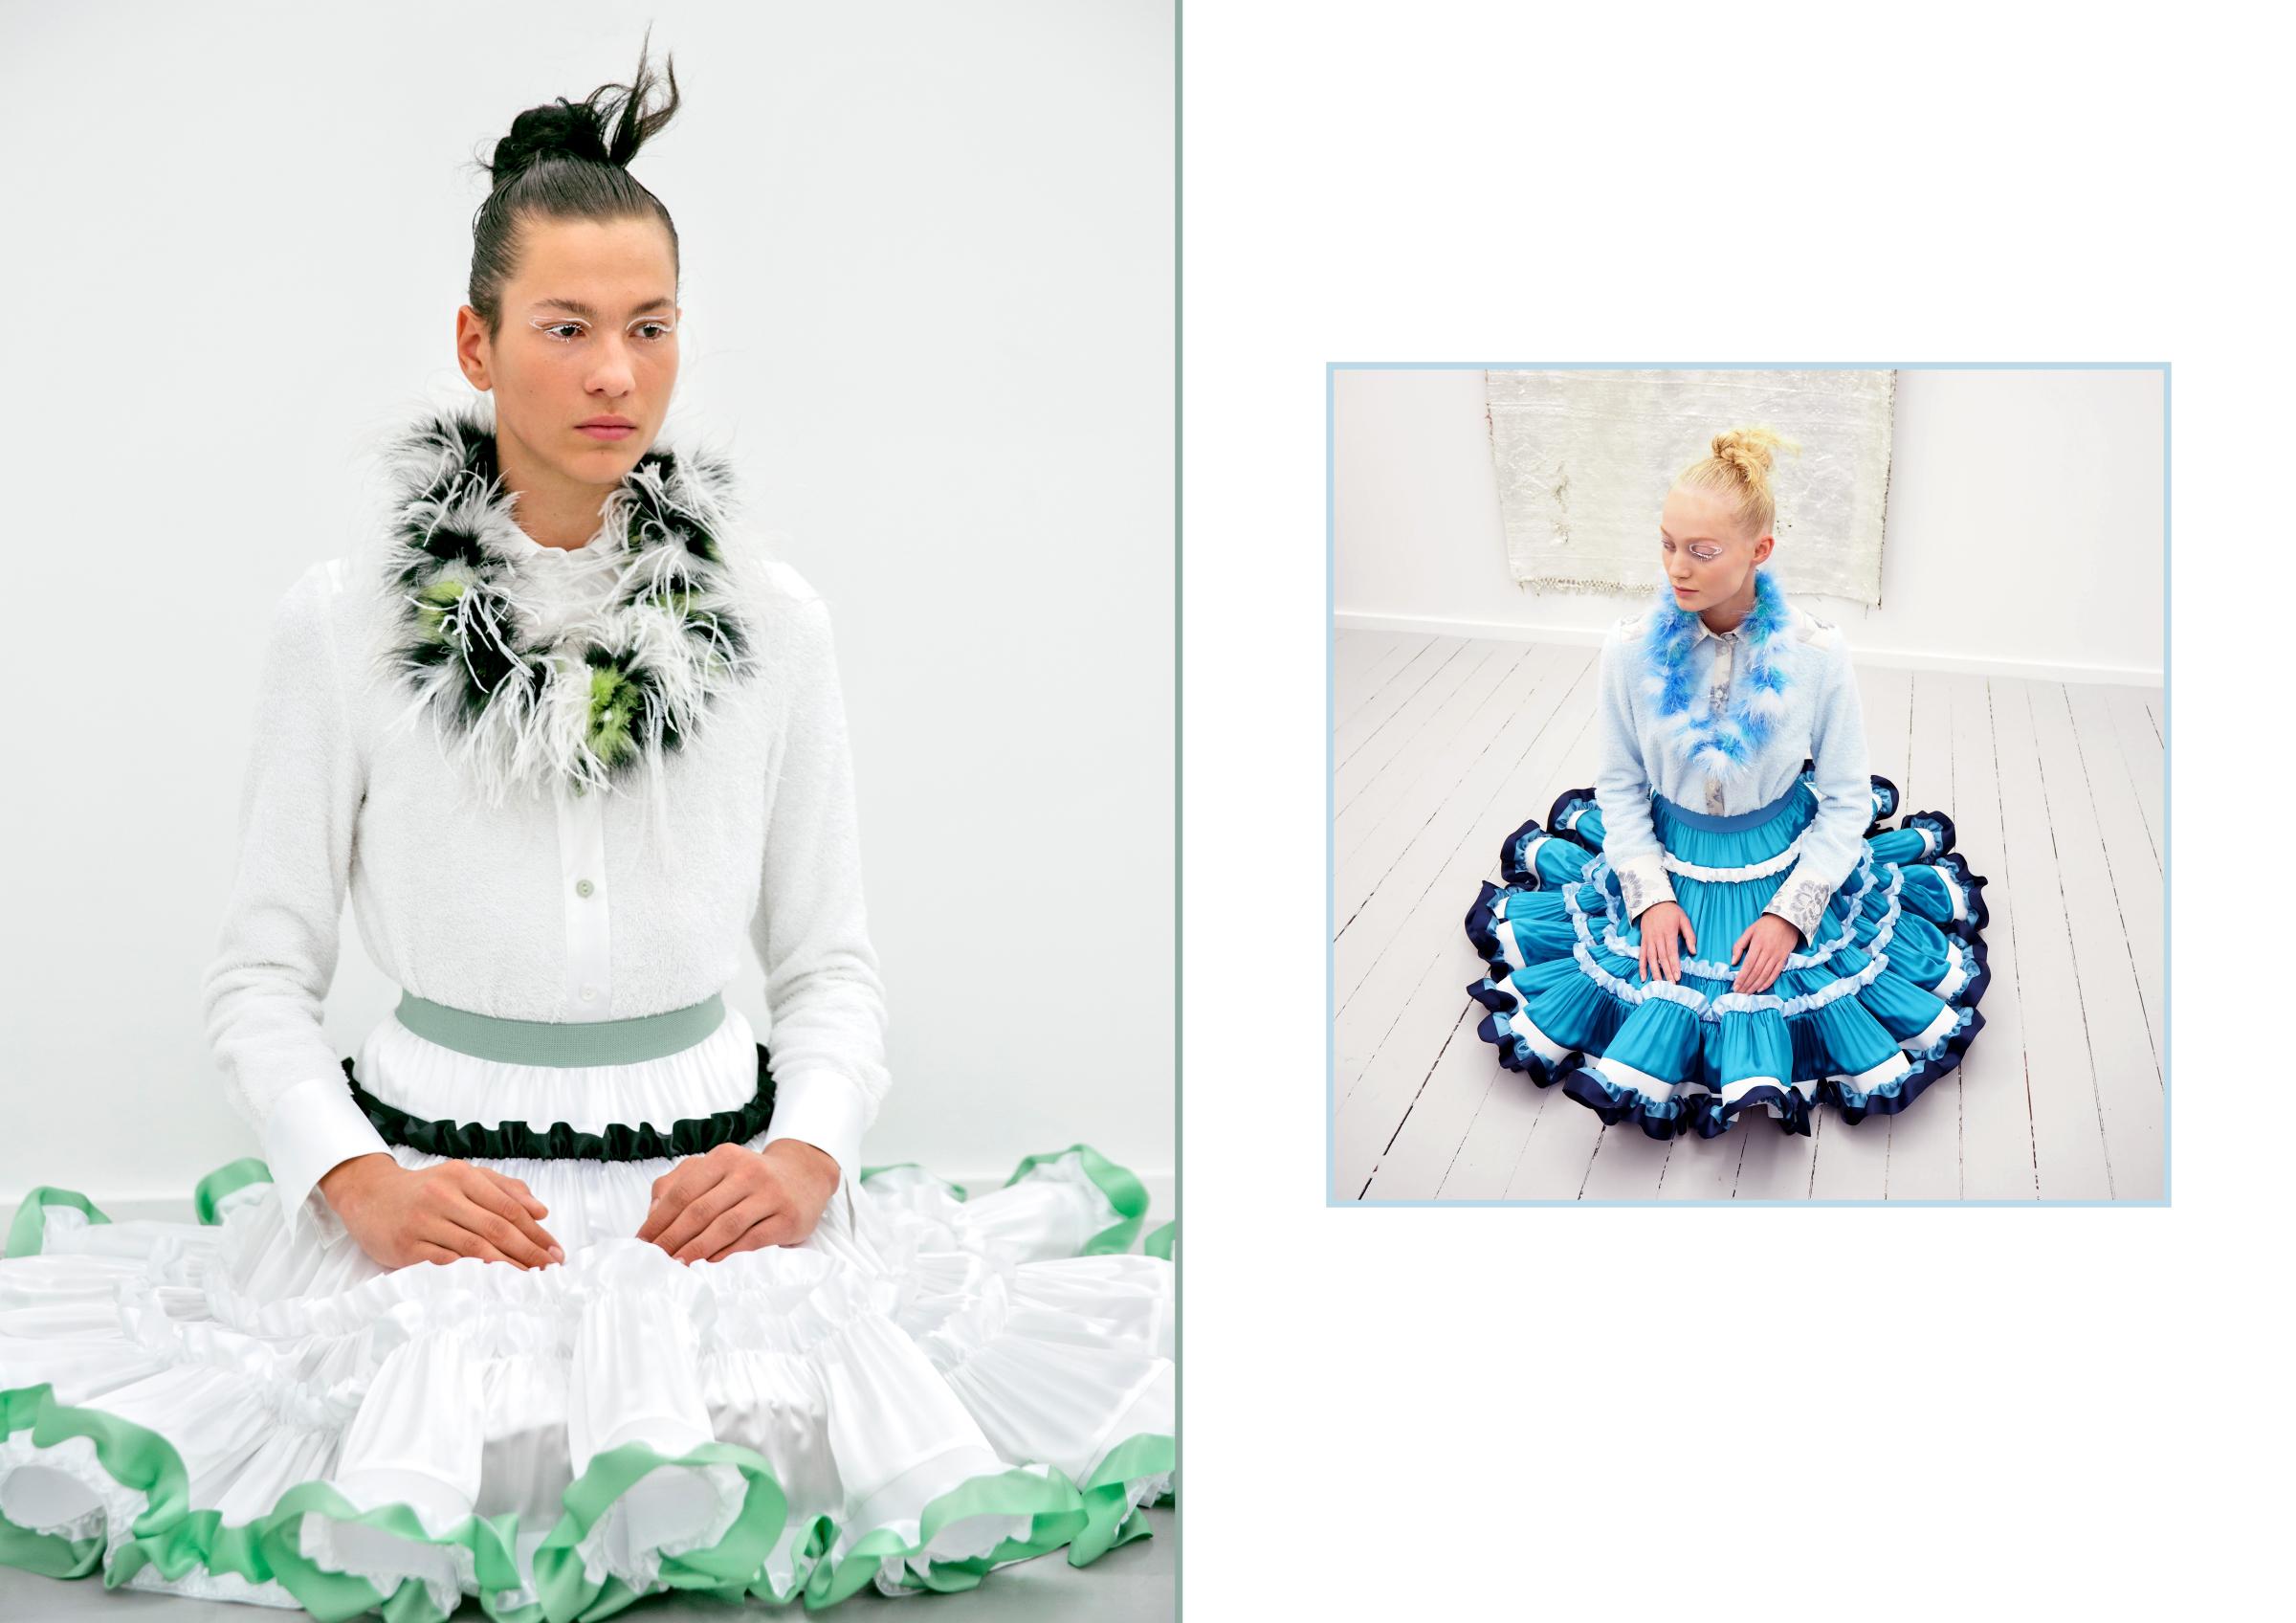 Photo: Left: Alexander Norheim / The Sceptic. Right: Lone Bru Kjær